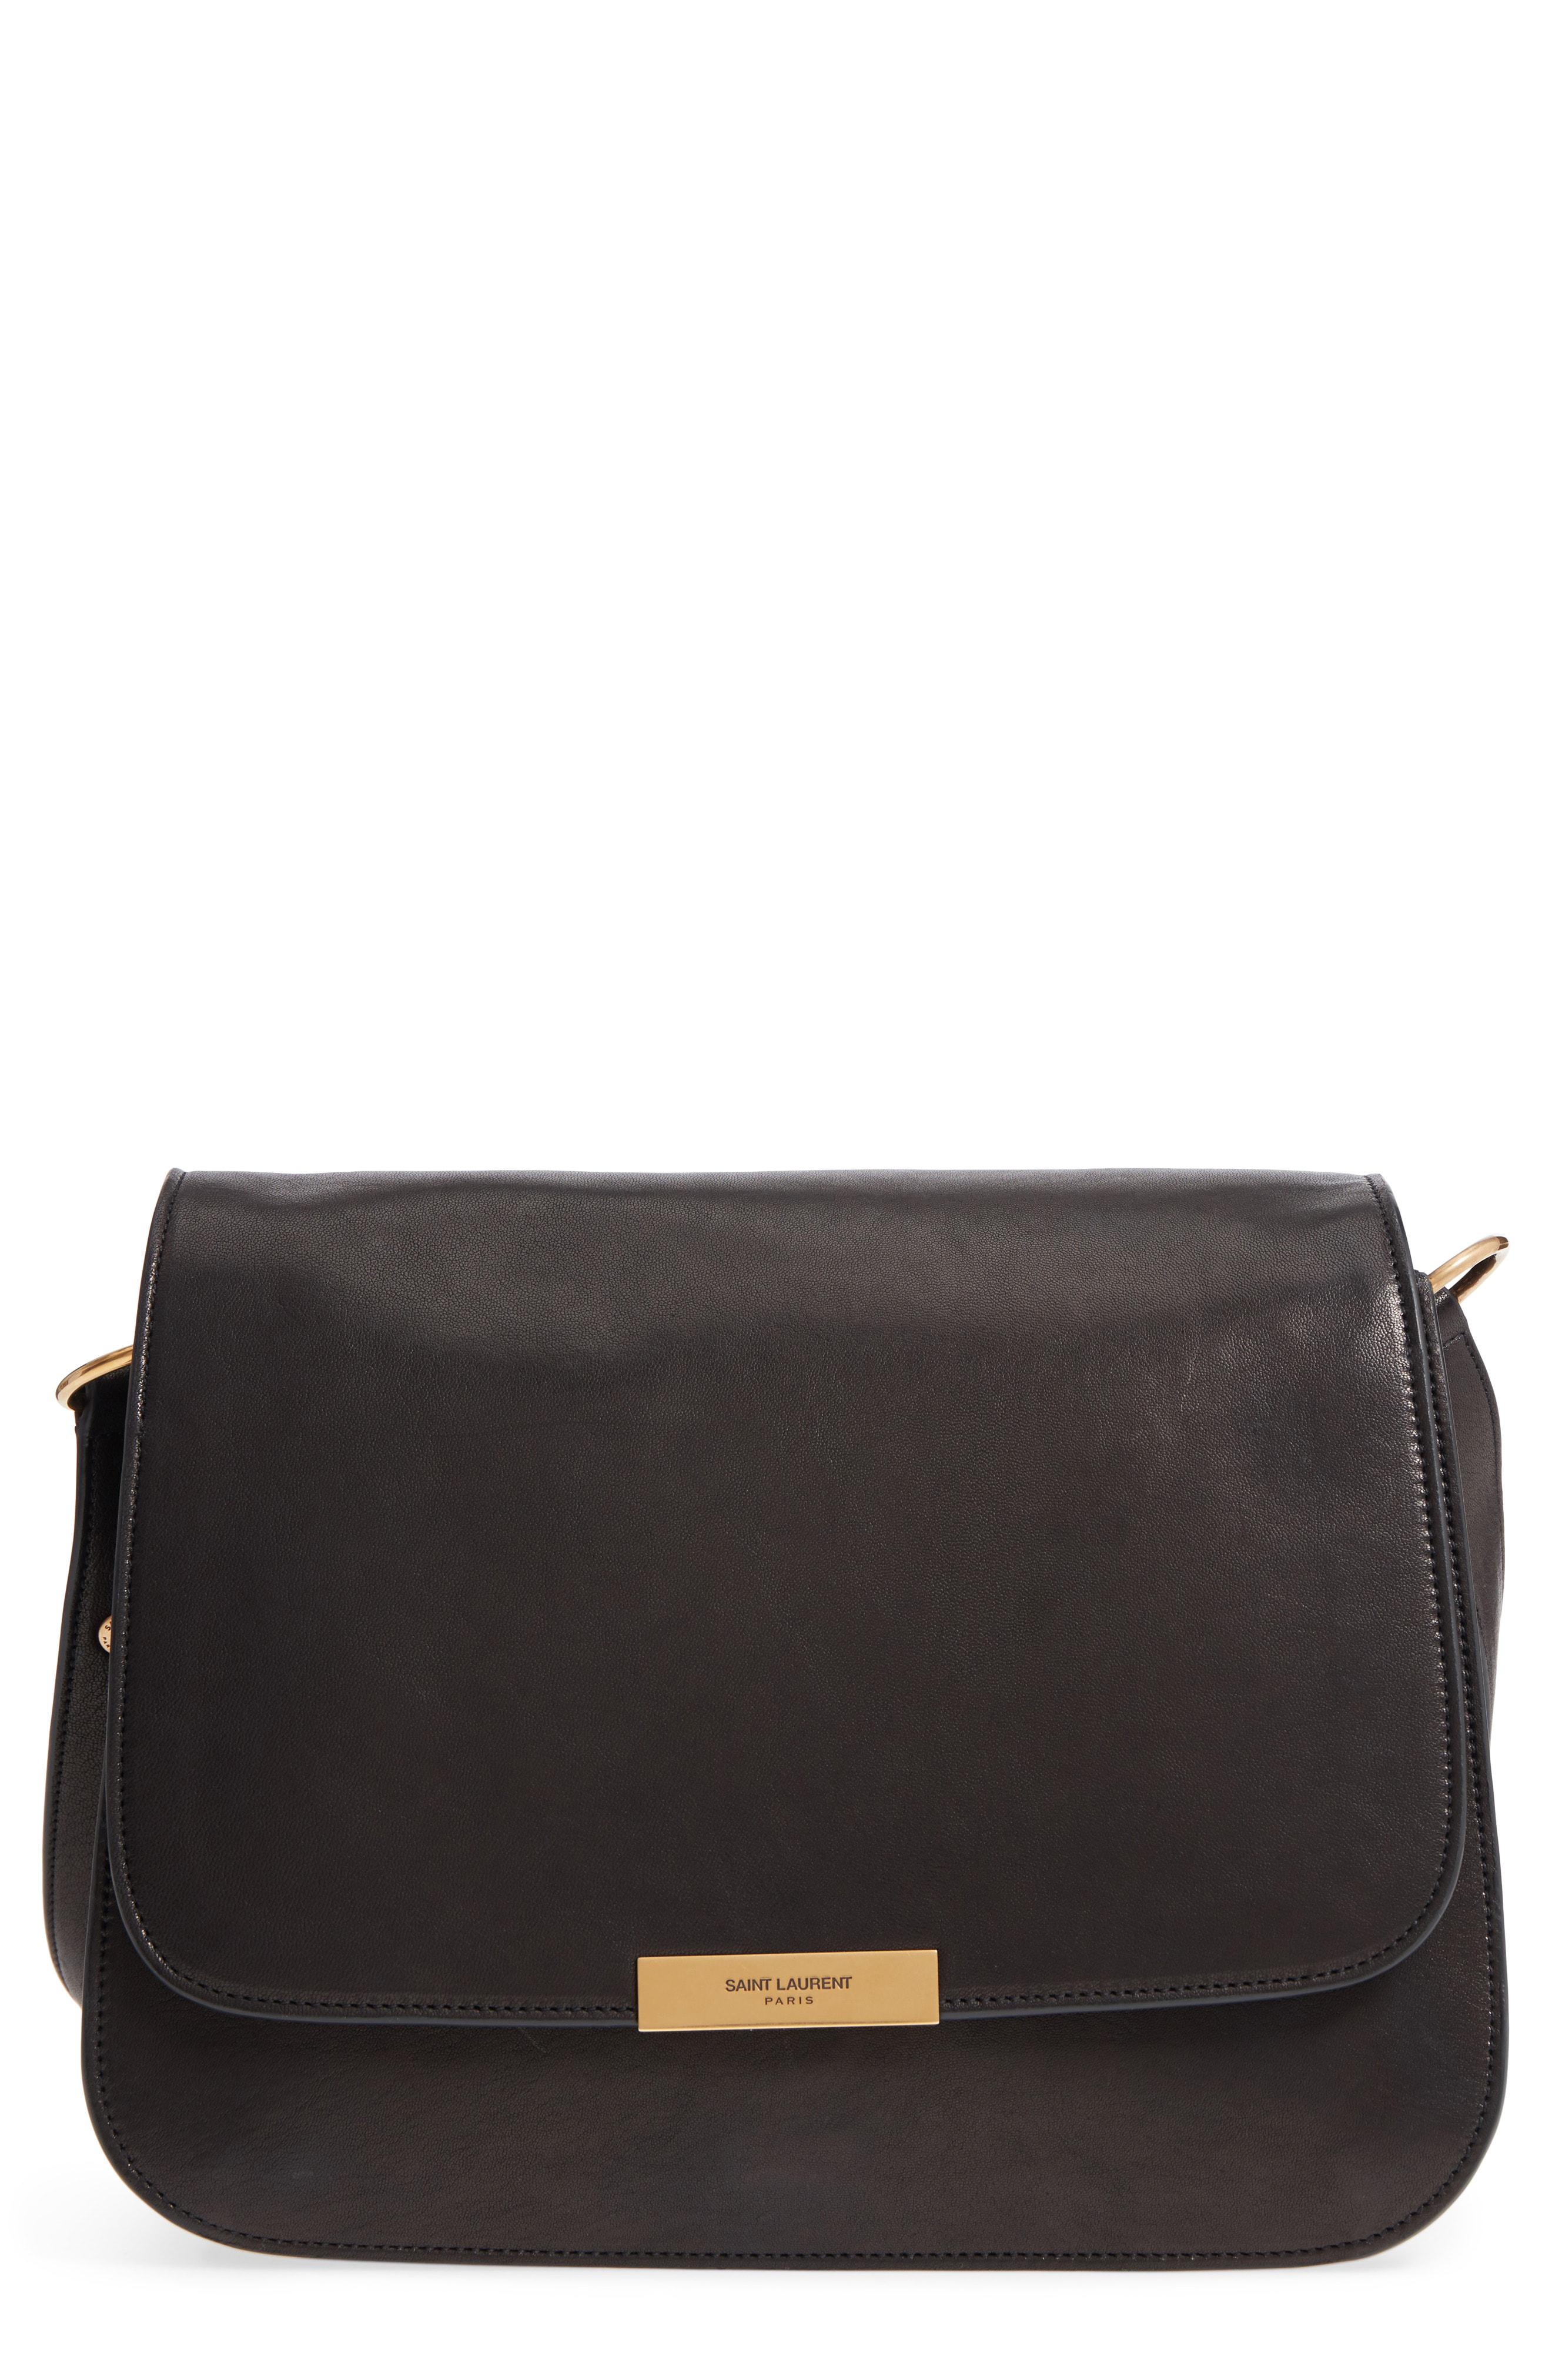 Lyst - Saint Laurent Amalia Leather Flap Shoulder Bag - in Black 8fa62483ae33e